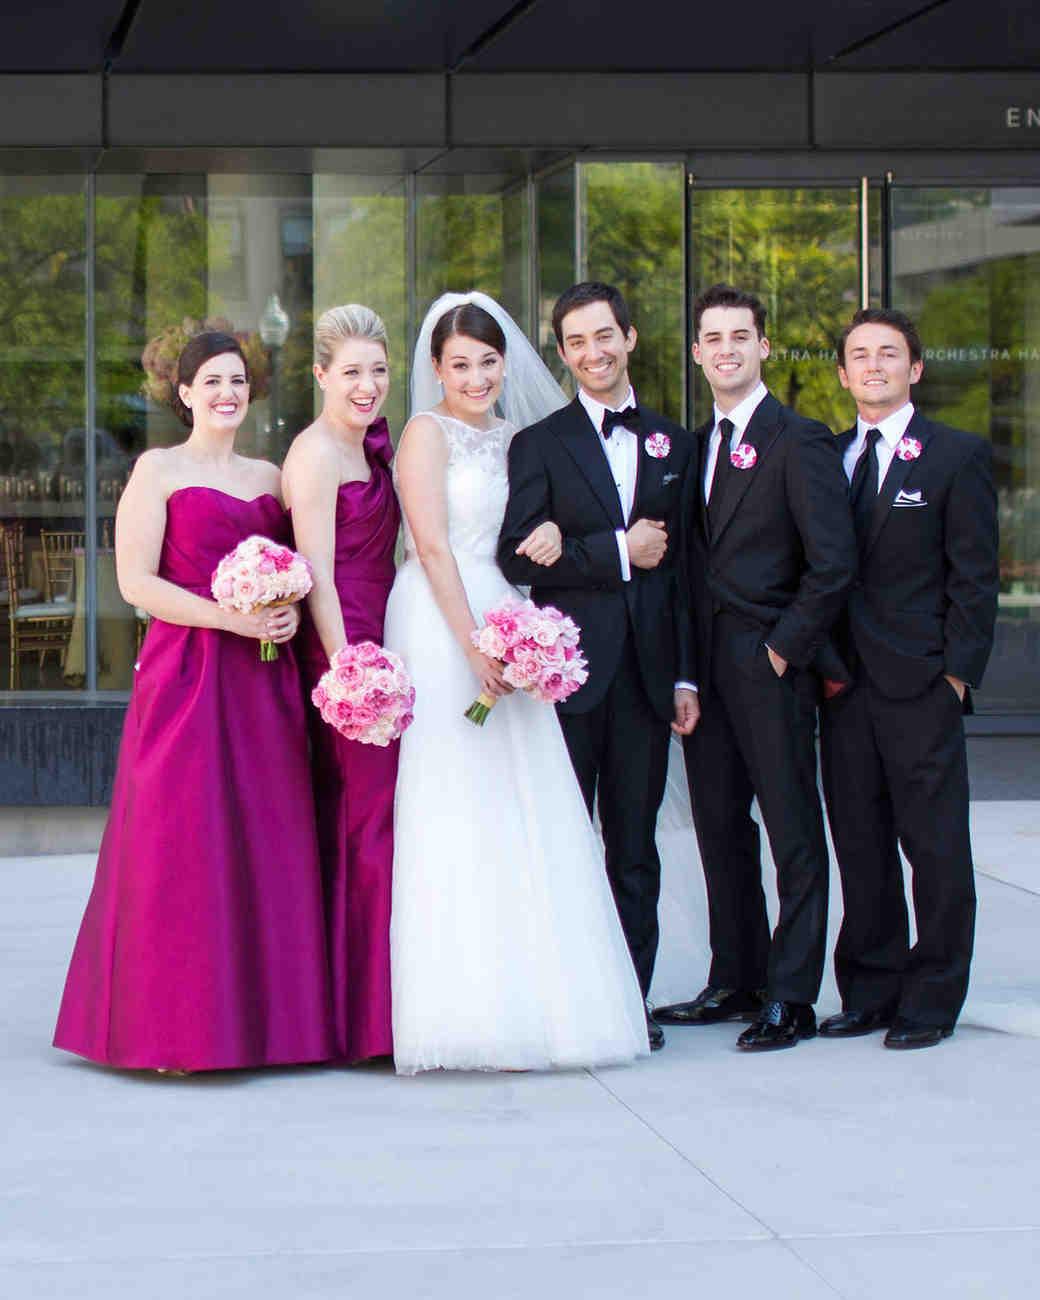 ashley-ryan-wedding-bridalparty-6105-s111852-0415.jpg